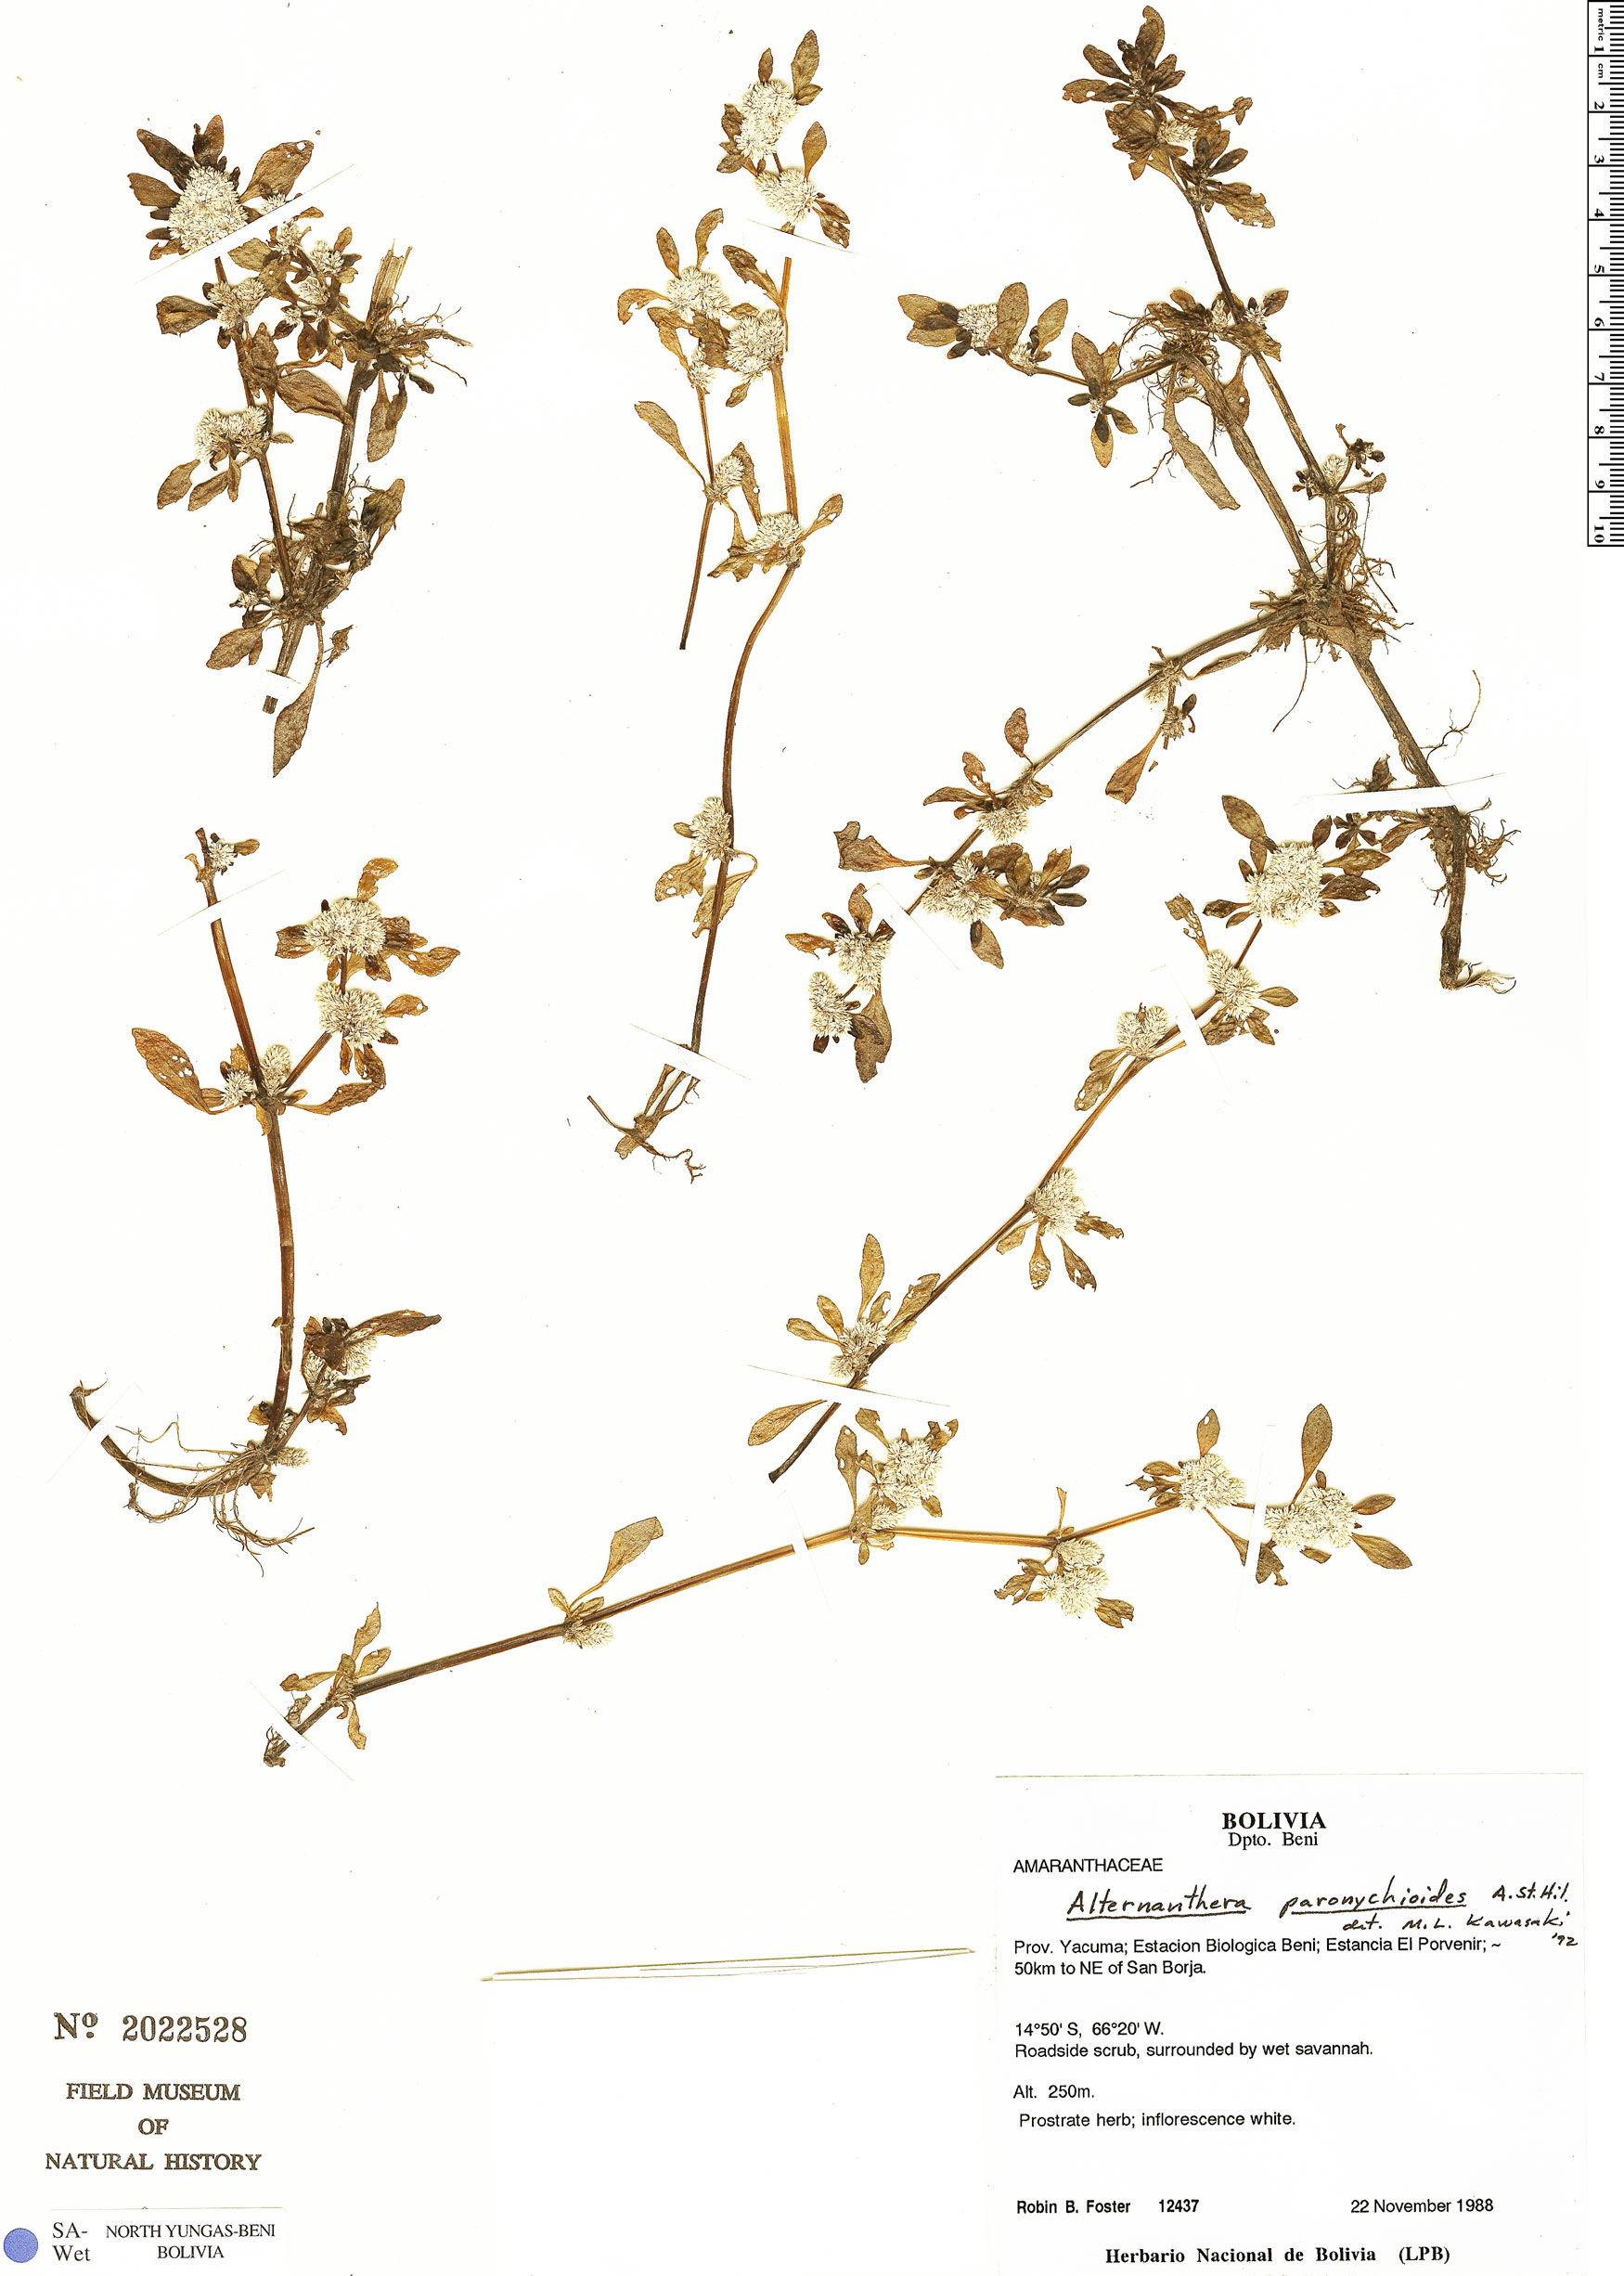 Espécime: Alternanthera paronychioides